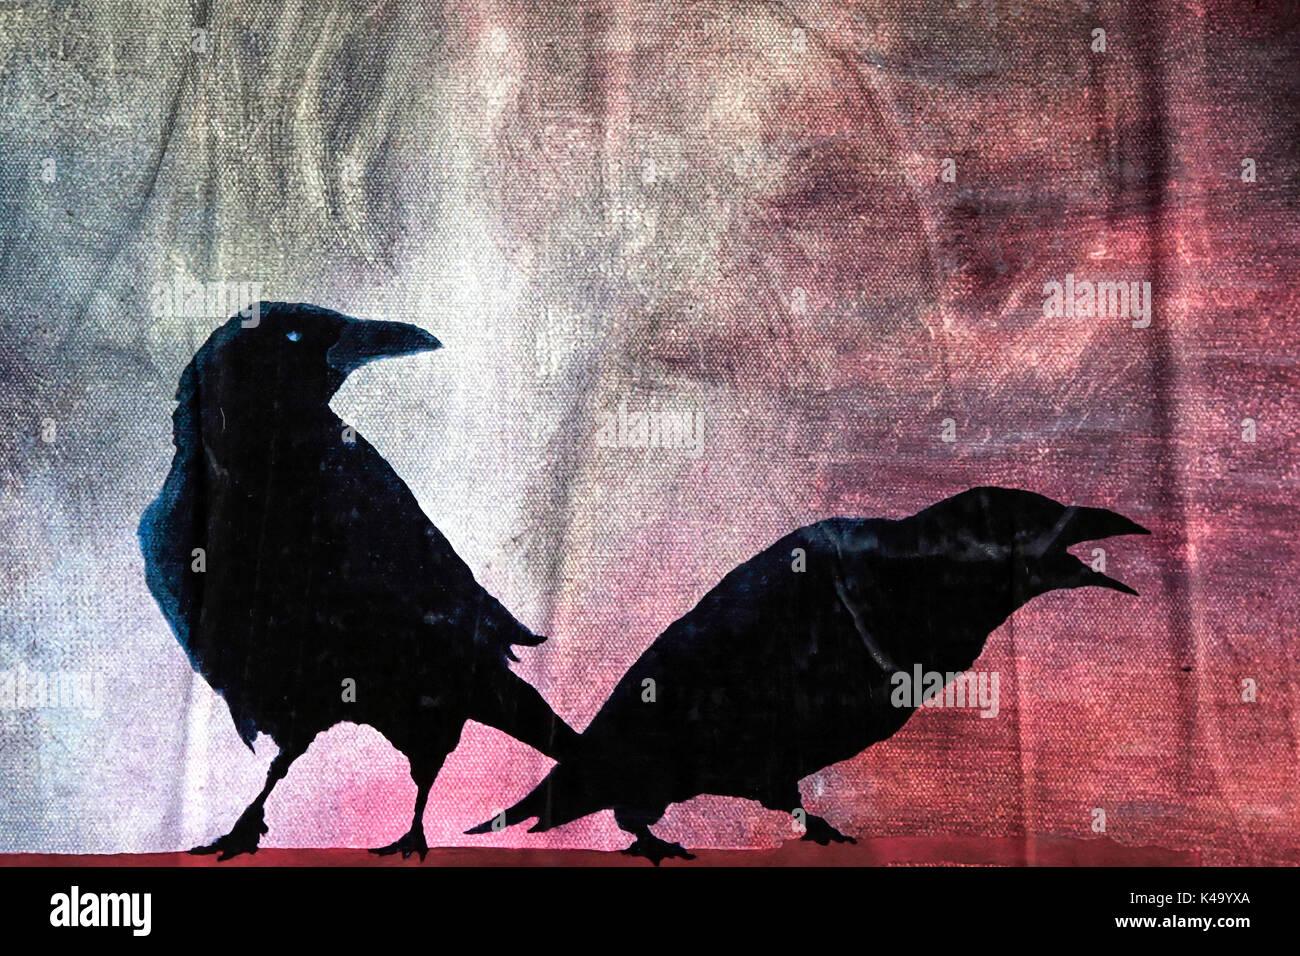 Silueta de dos cuervos Imagen De Stock